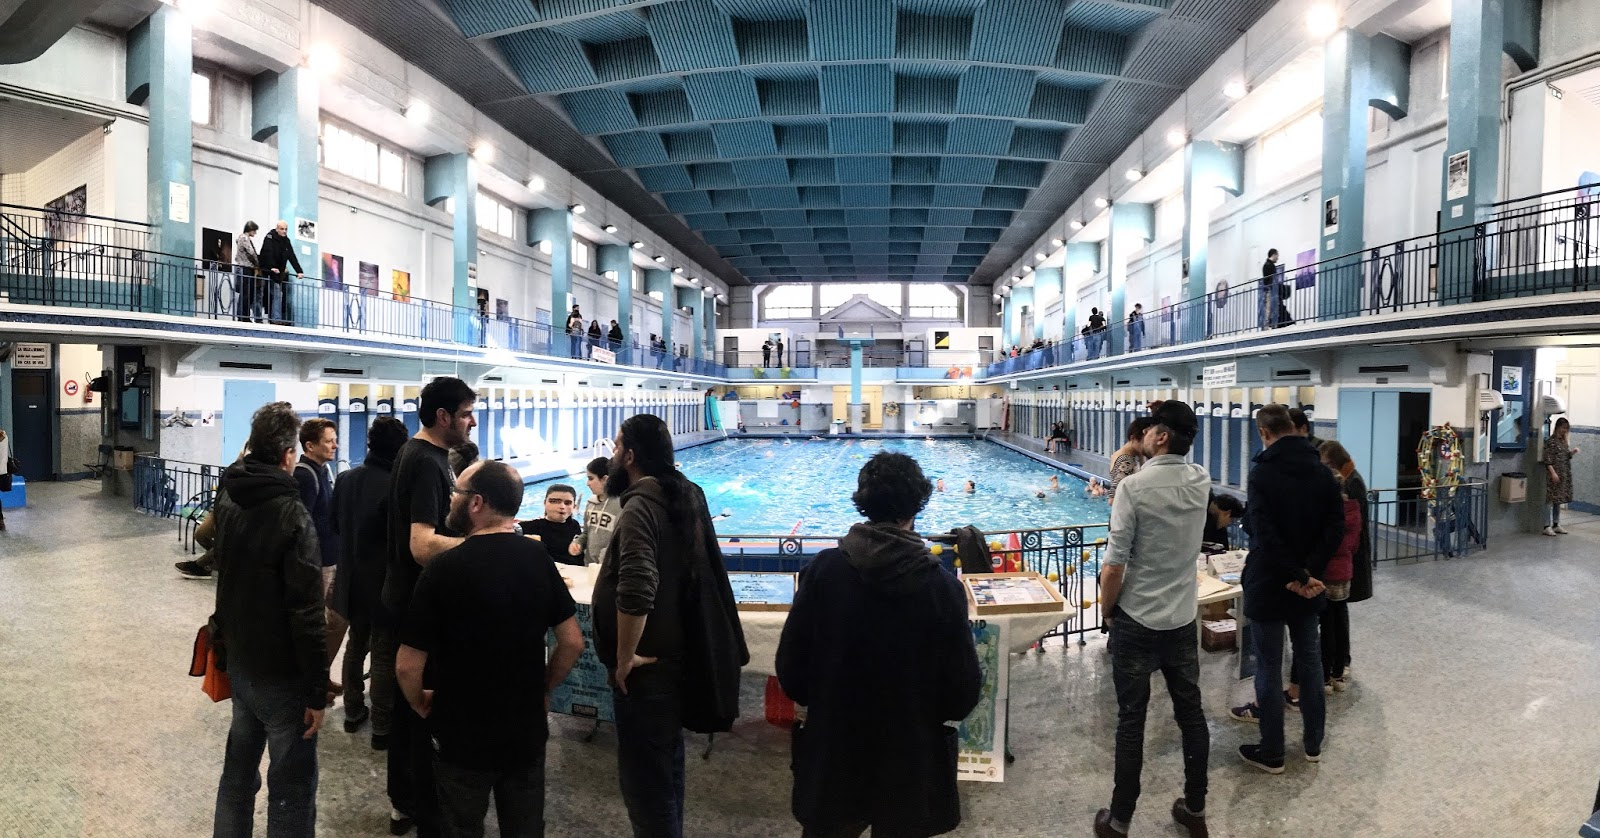 piscine-rennes-georges-exposition-polaroid